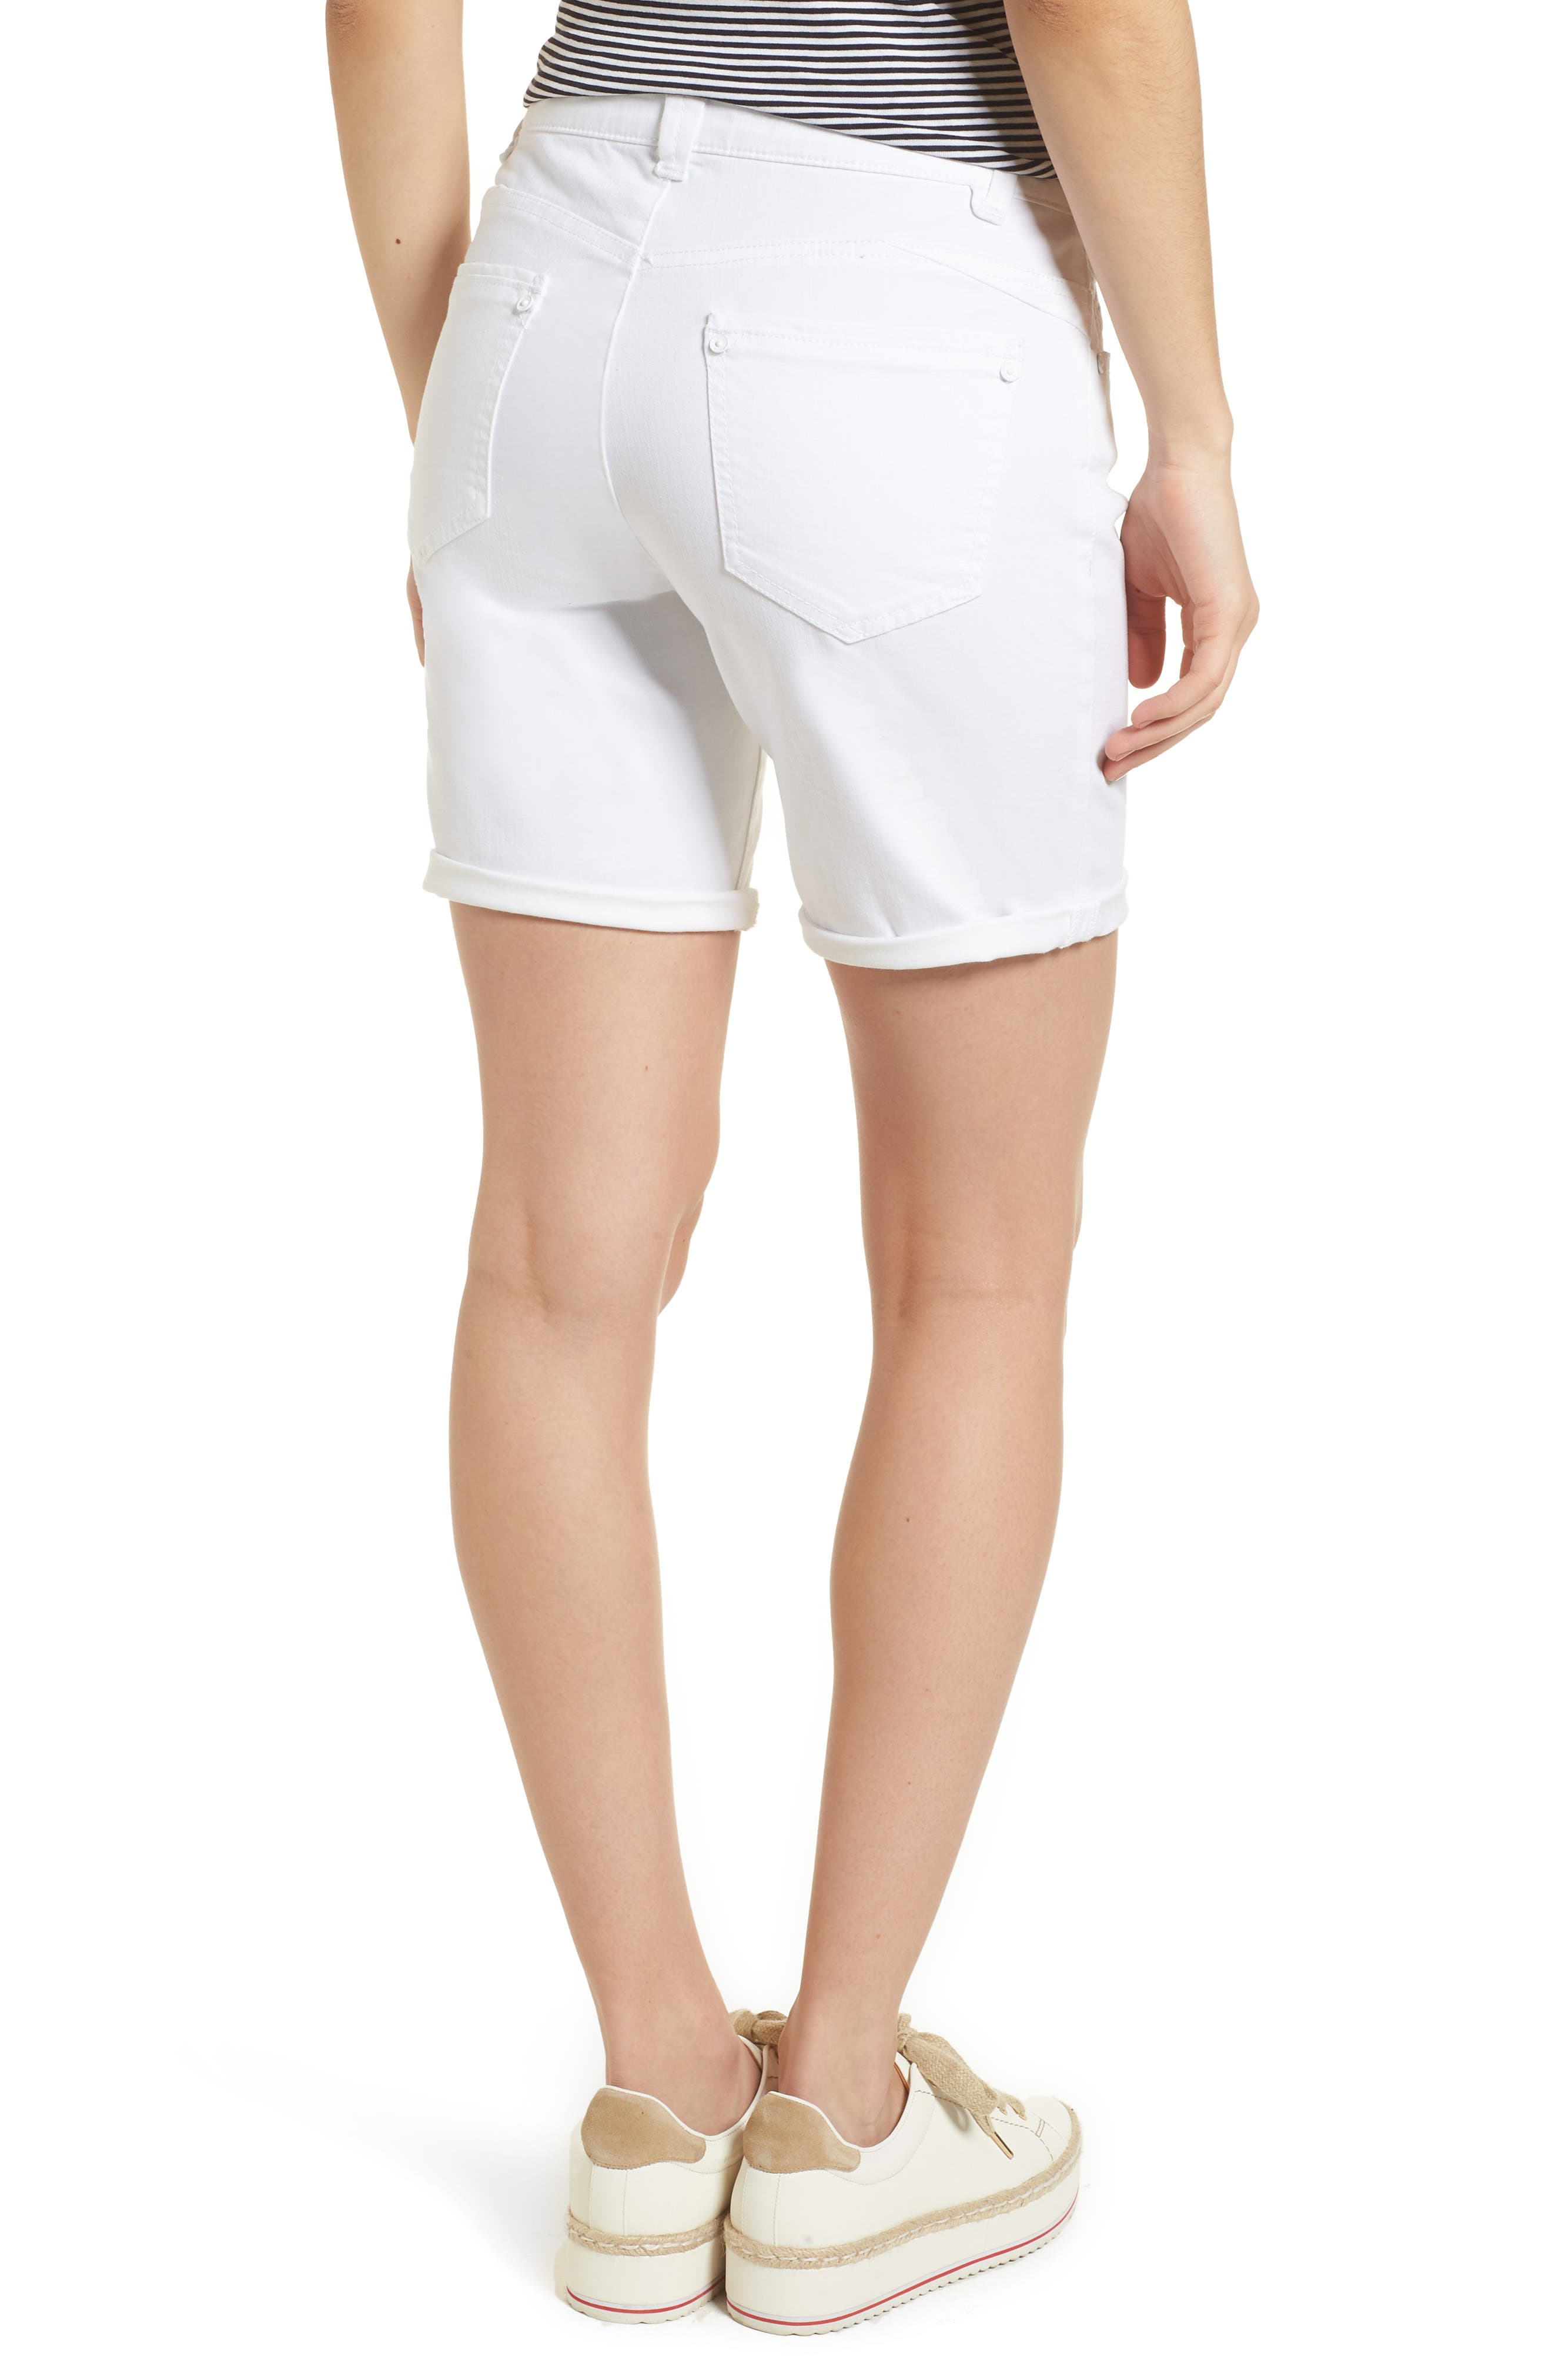 Ab-Solution White Denim Shorts,                             Alternate thumbnail 2, color,                             Optic White